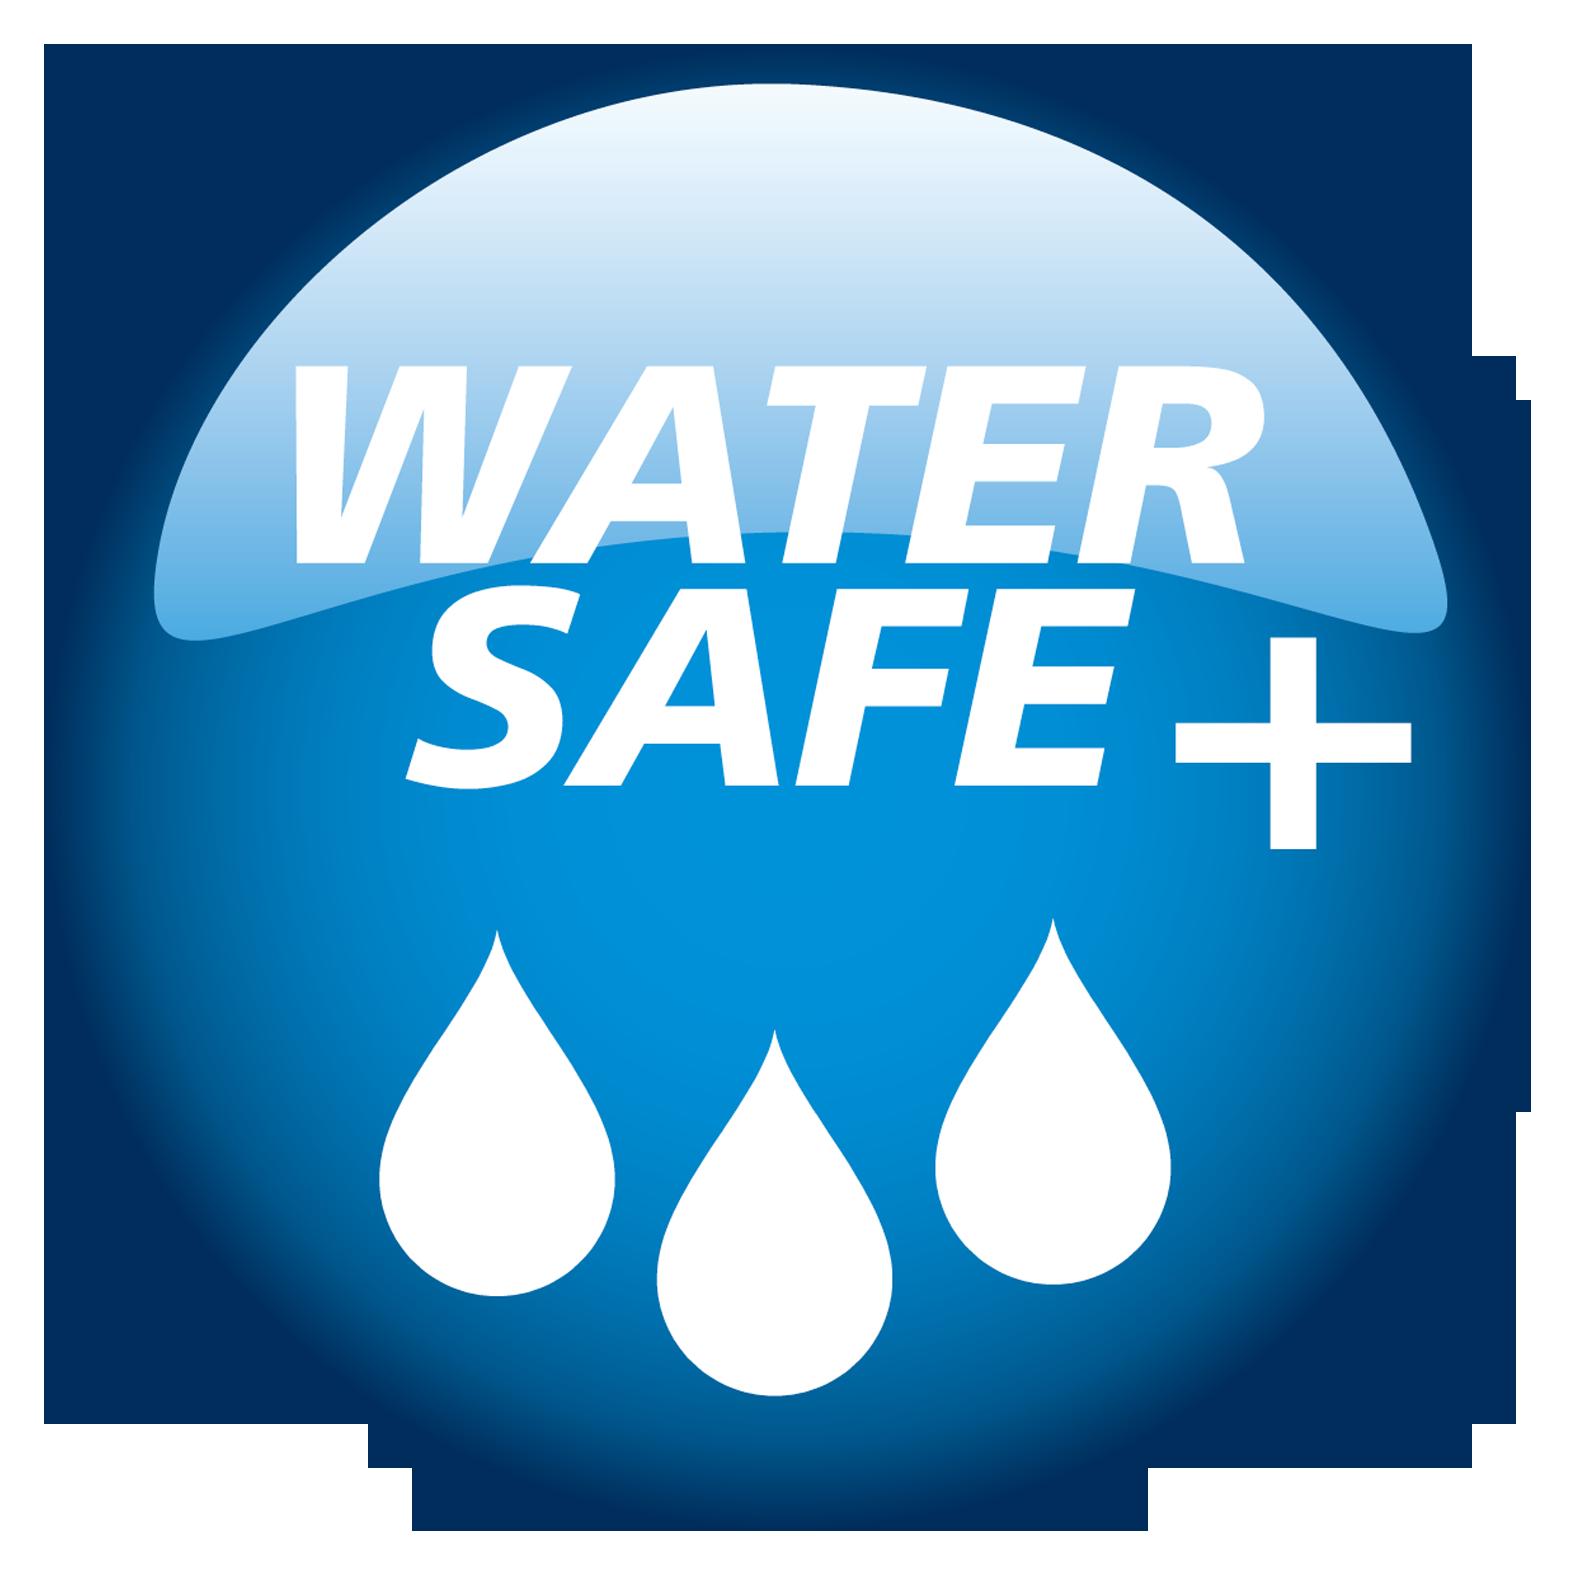 WaterSafe+ sigurnosni sistem